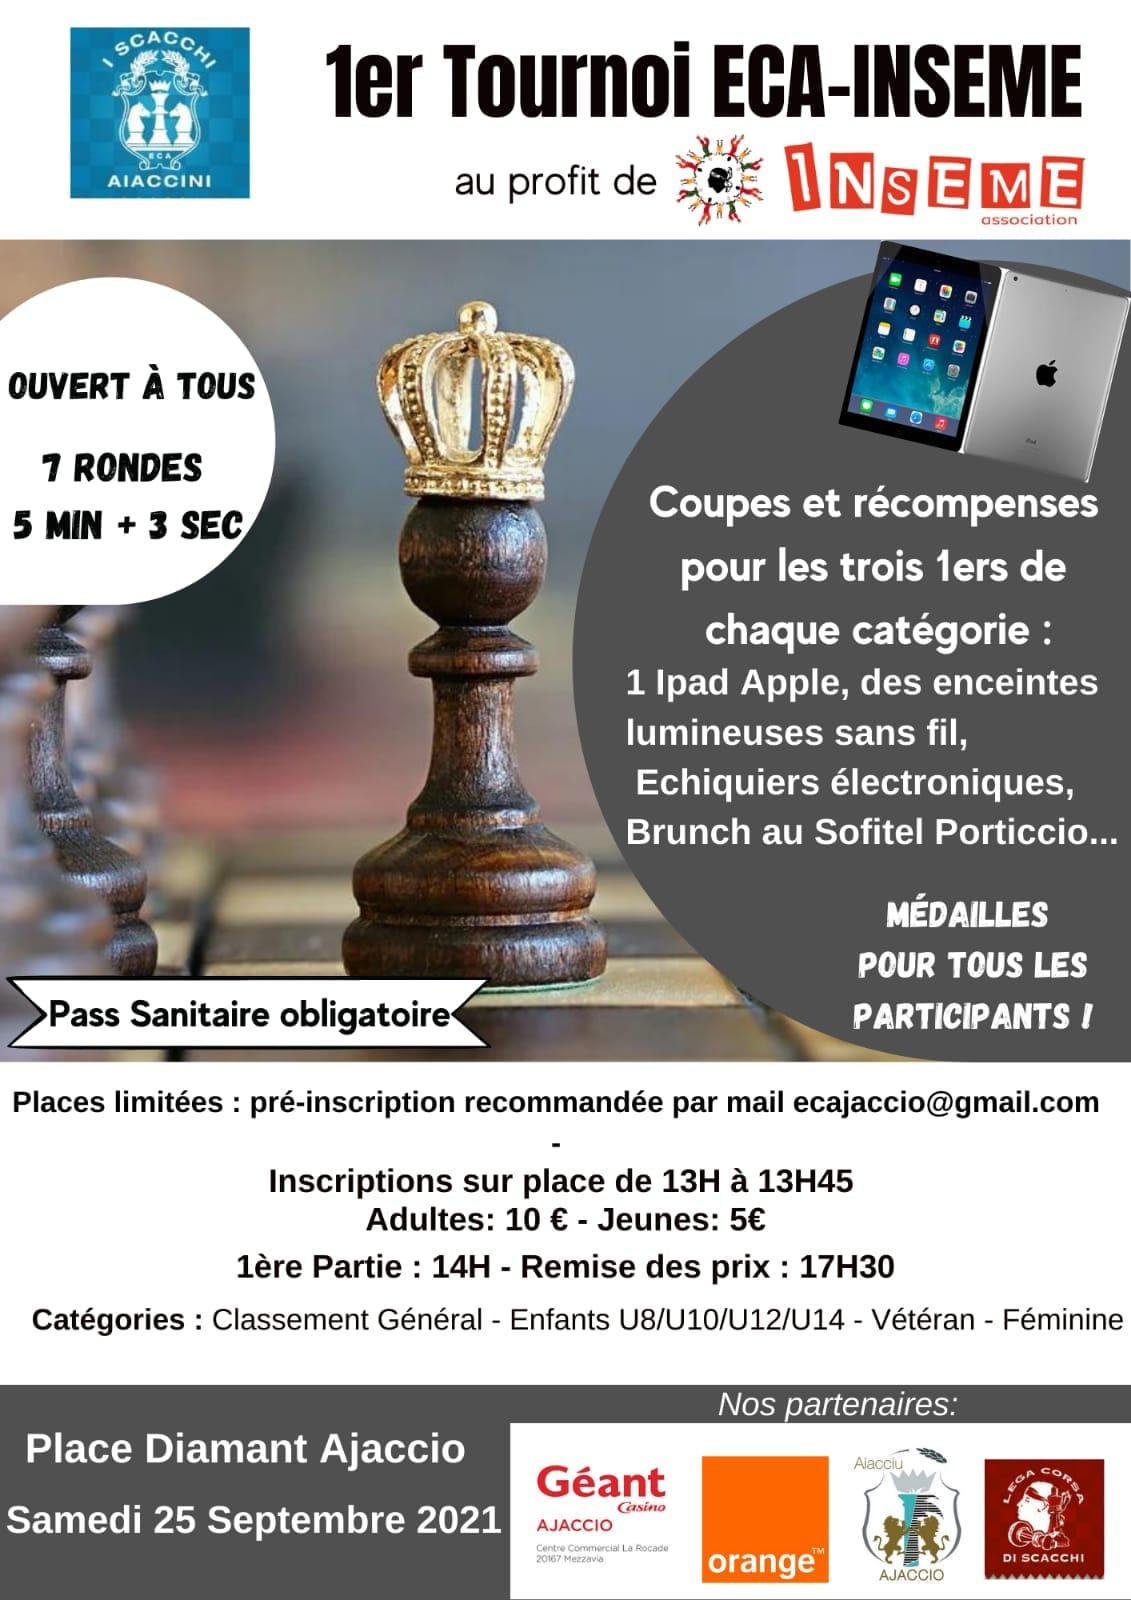 1 er tournoi ECA-INSEME 25/09/2021 Place du Diamant